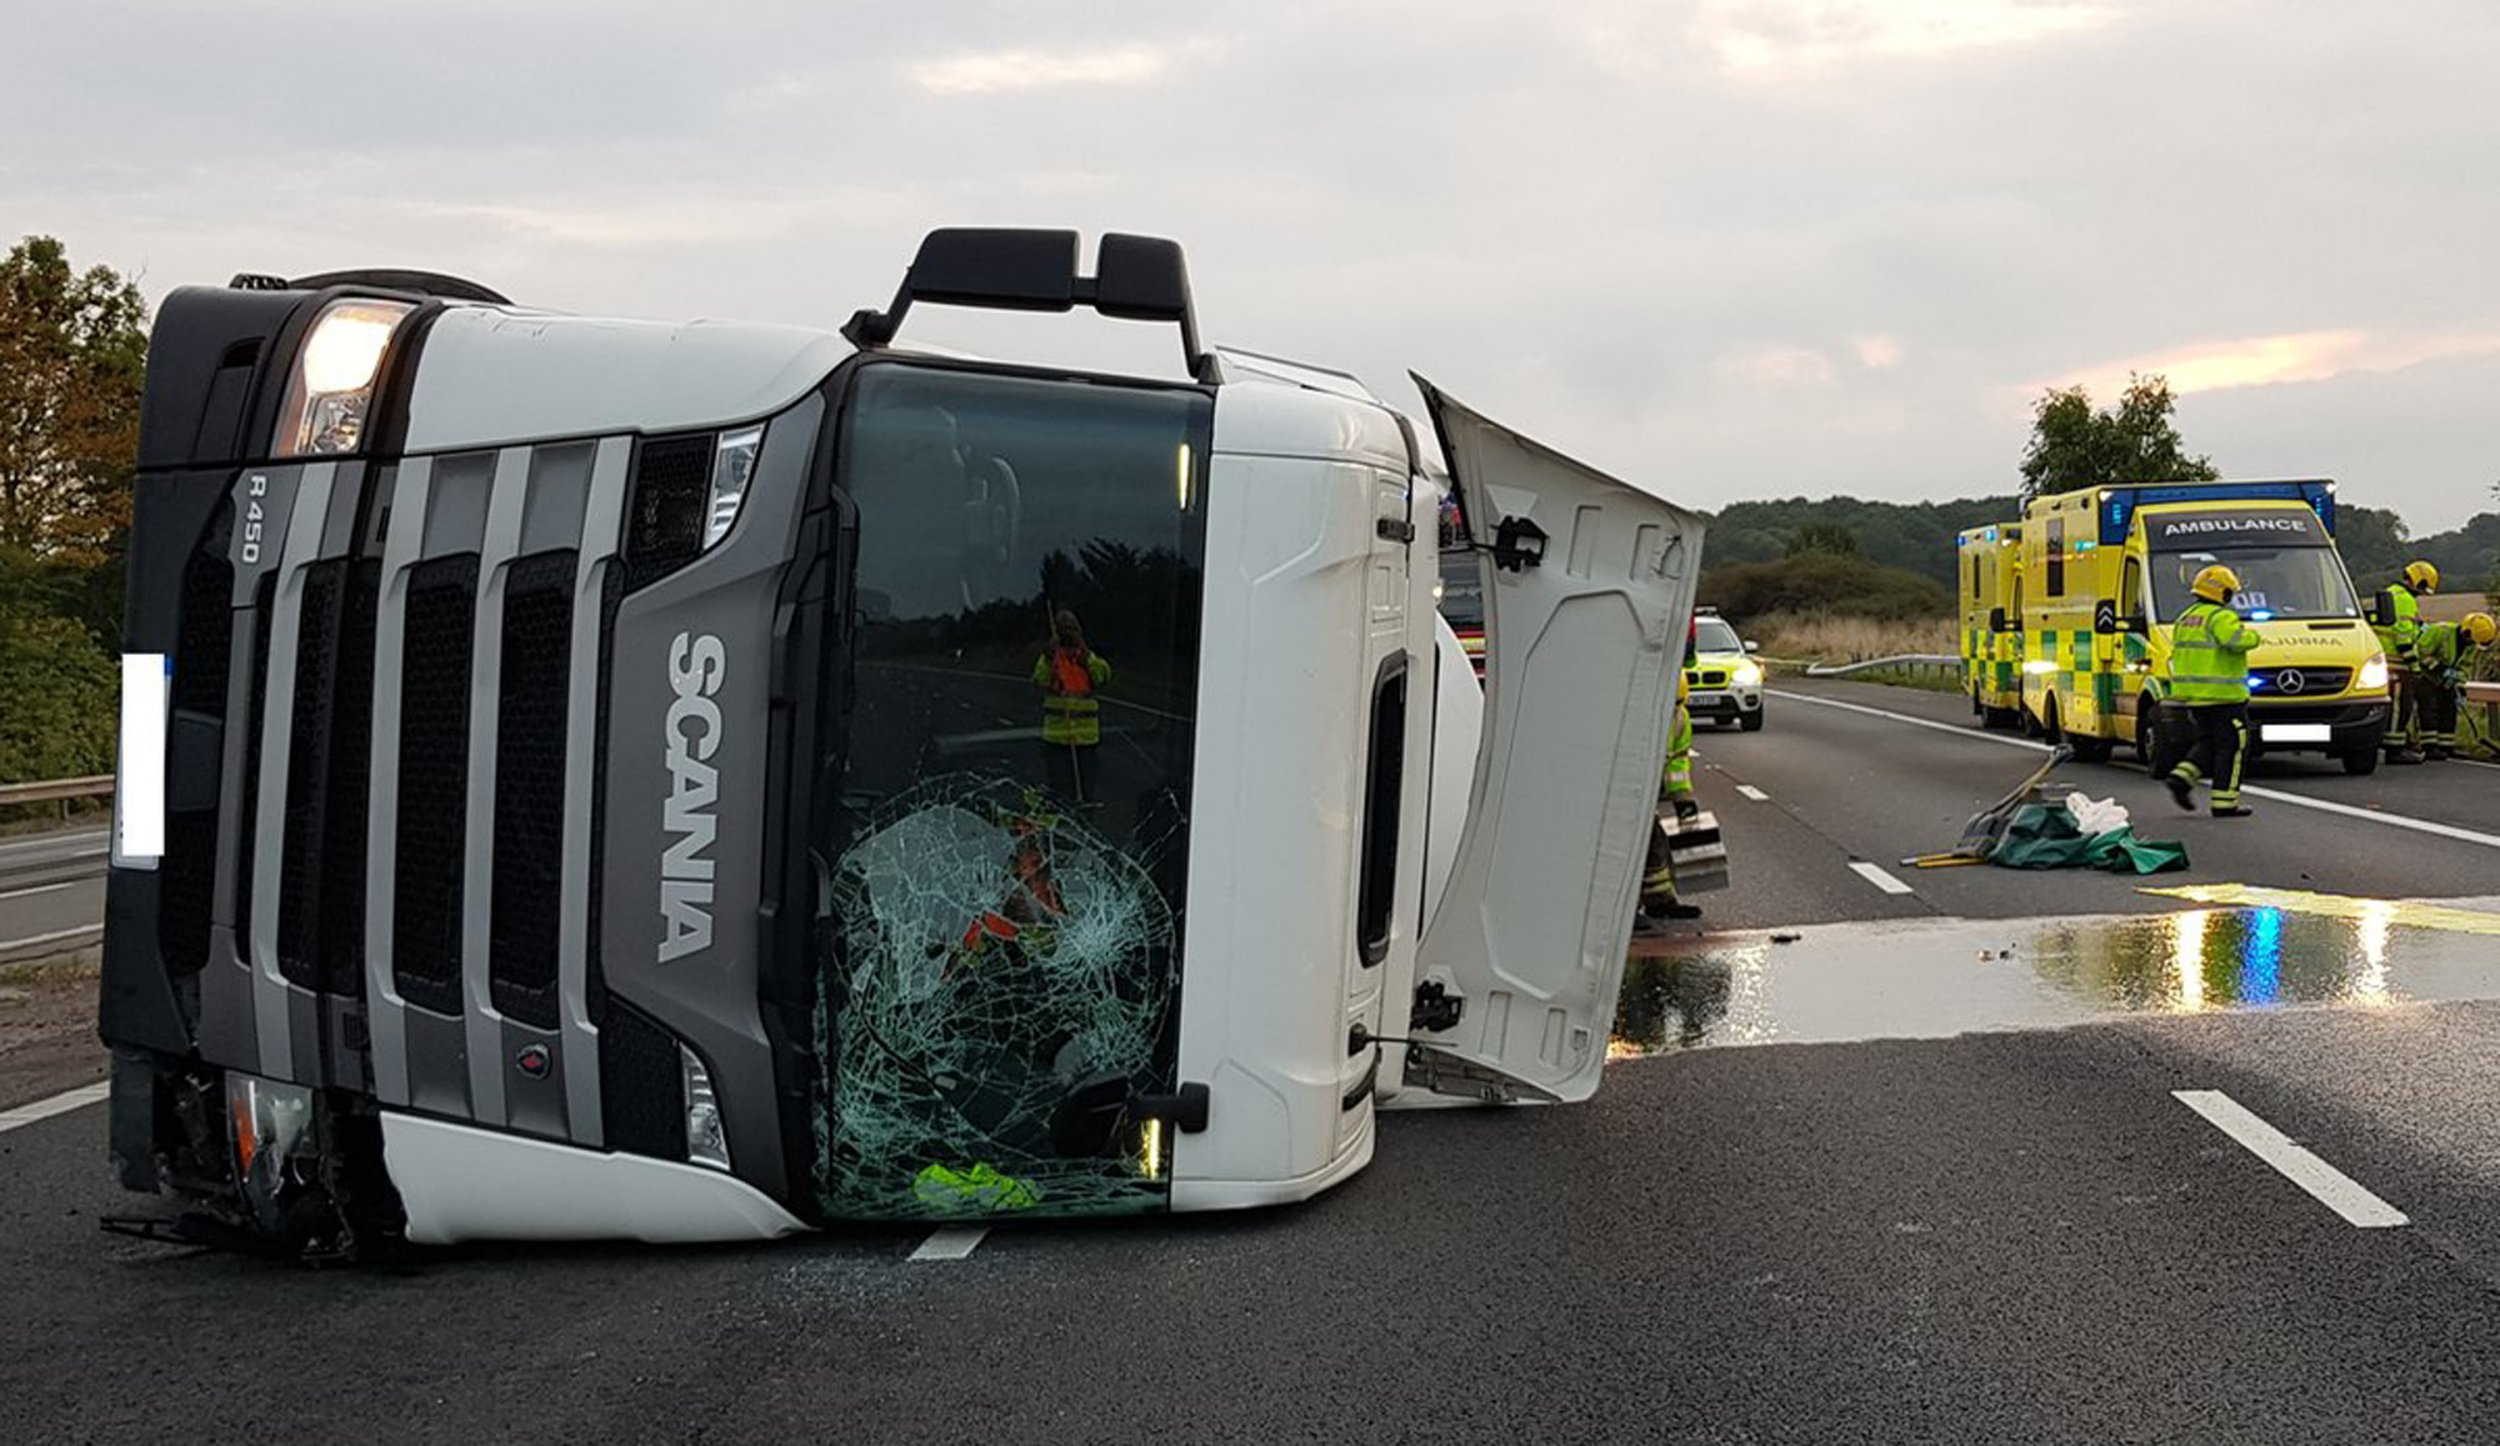 M4 motorway shut after milk tanker crashes and spills fuel in road